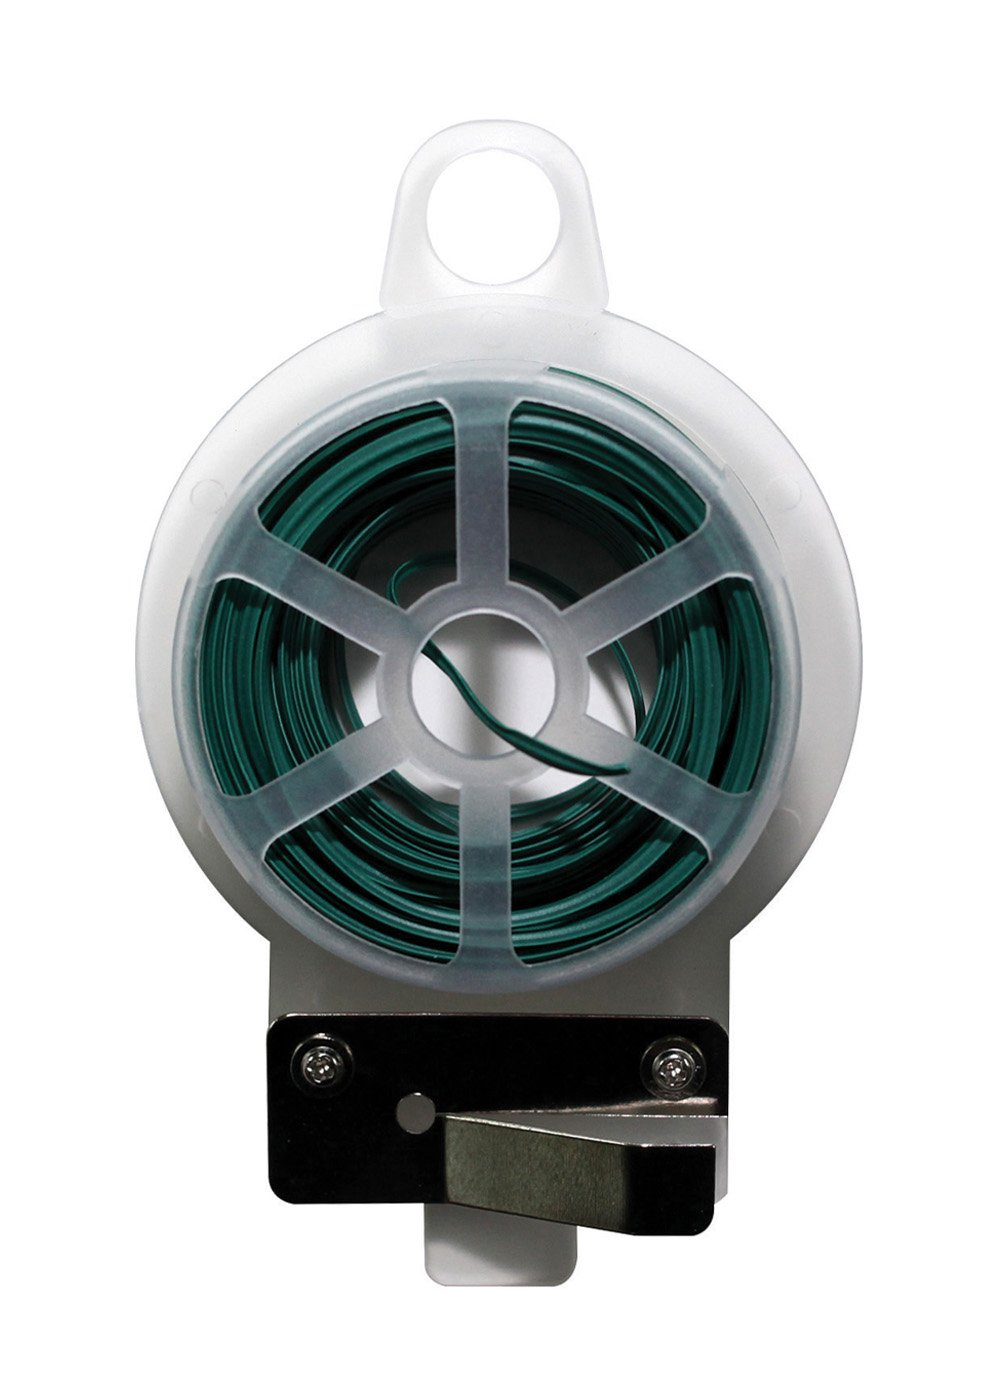 Nicks Choice Green Wire Twist Garland Tie in Dispenser Dyno Seasonal Solutions St 24-Feet